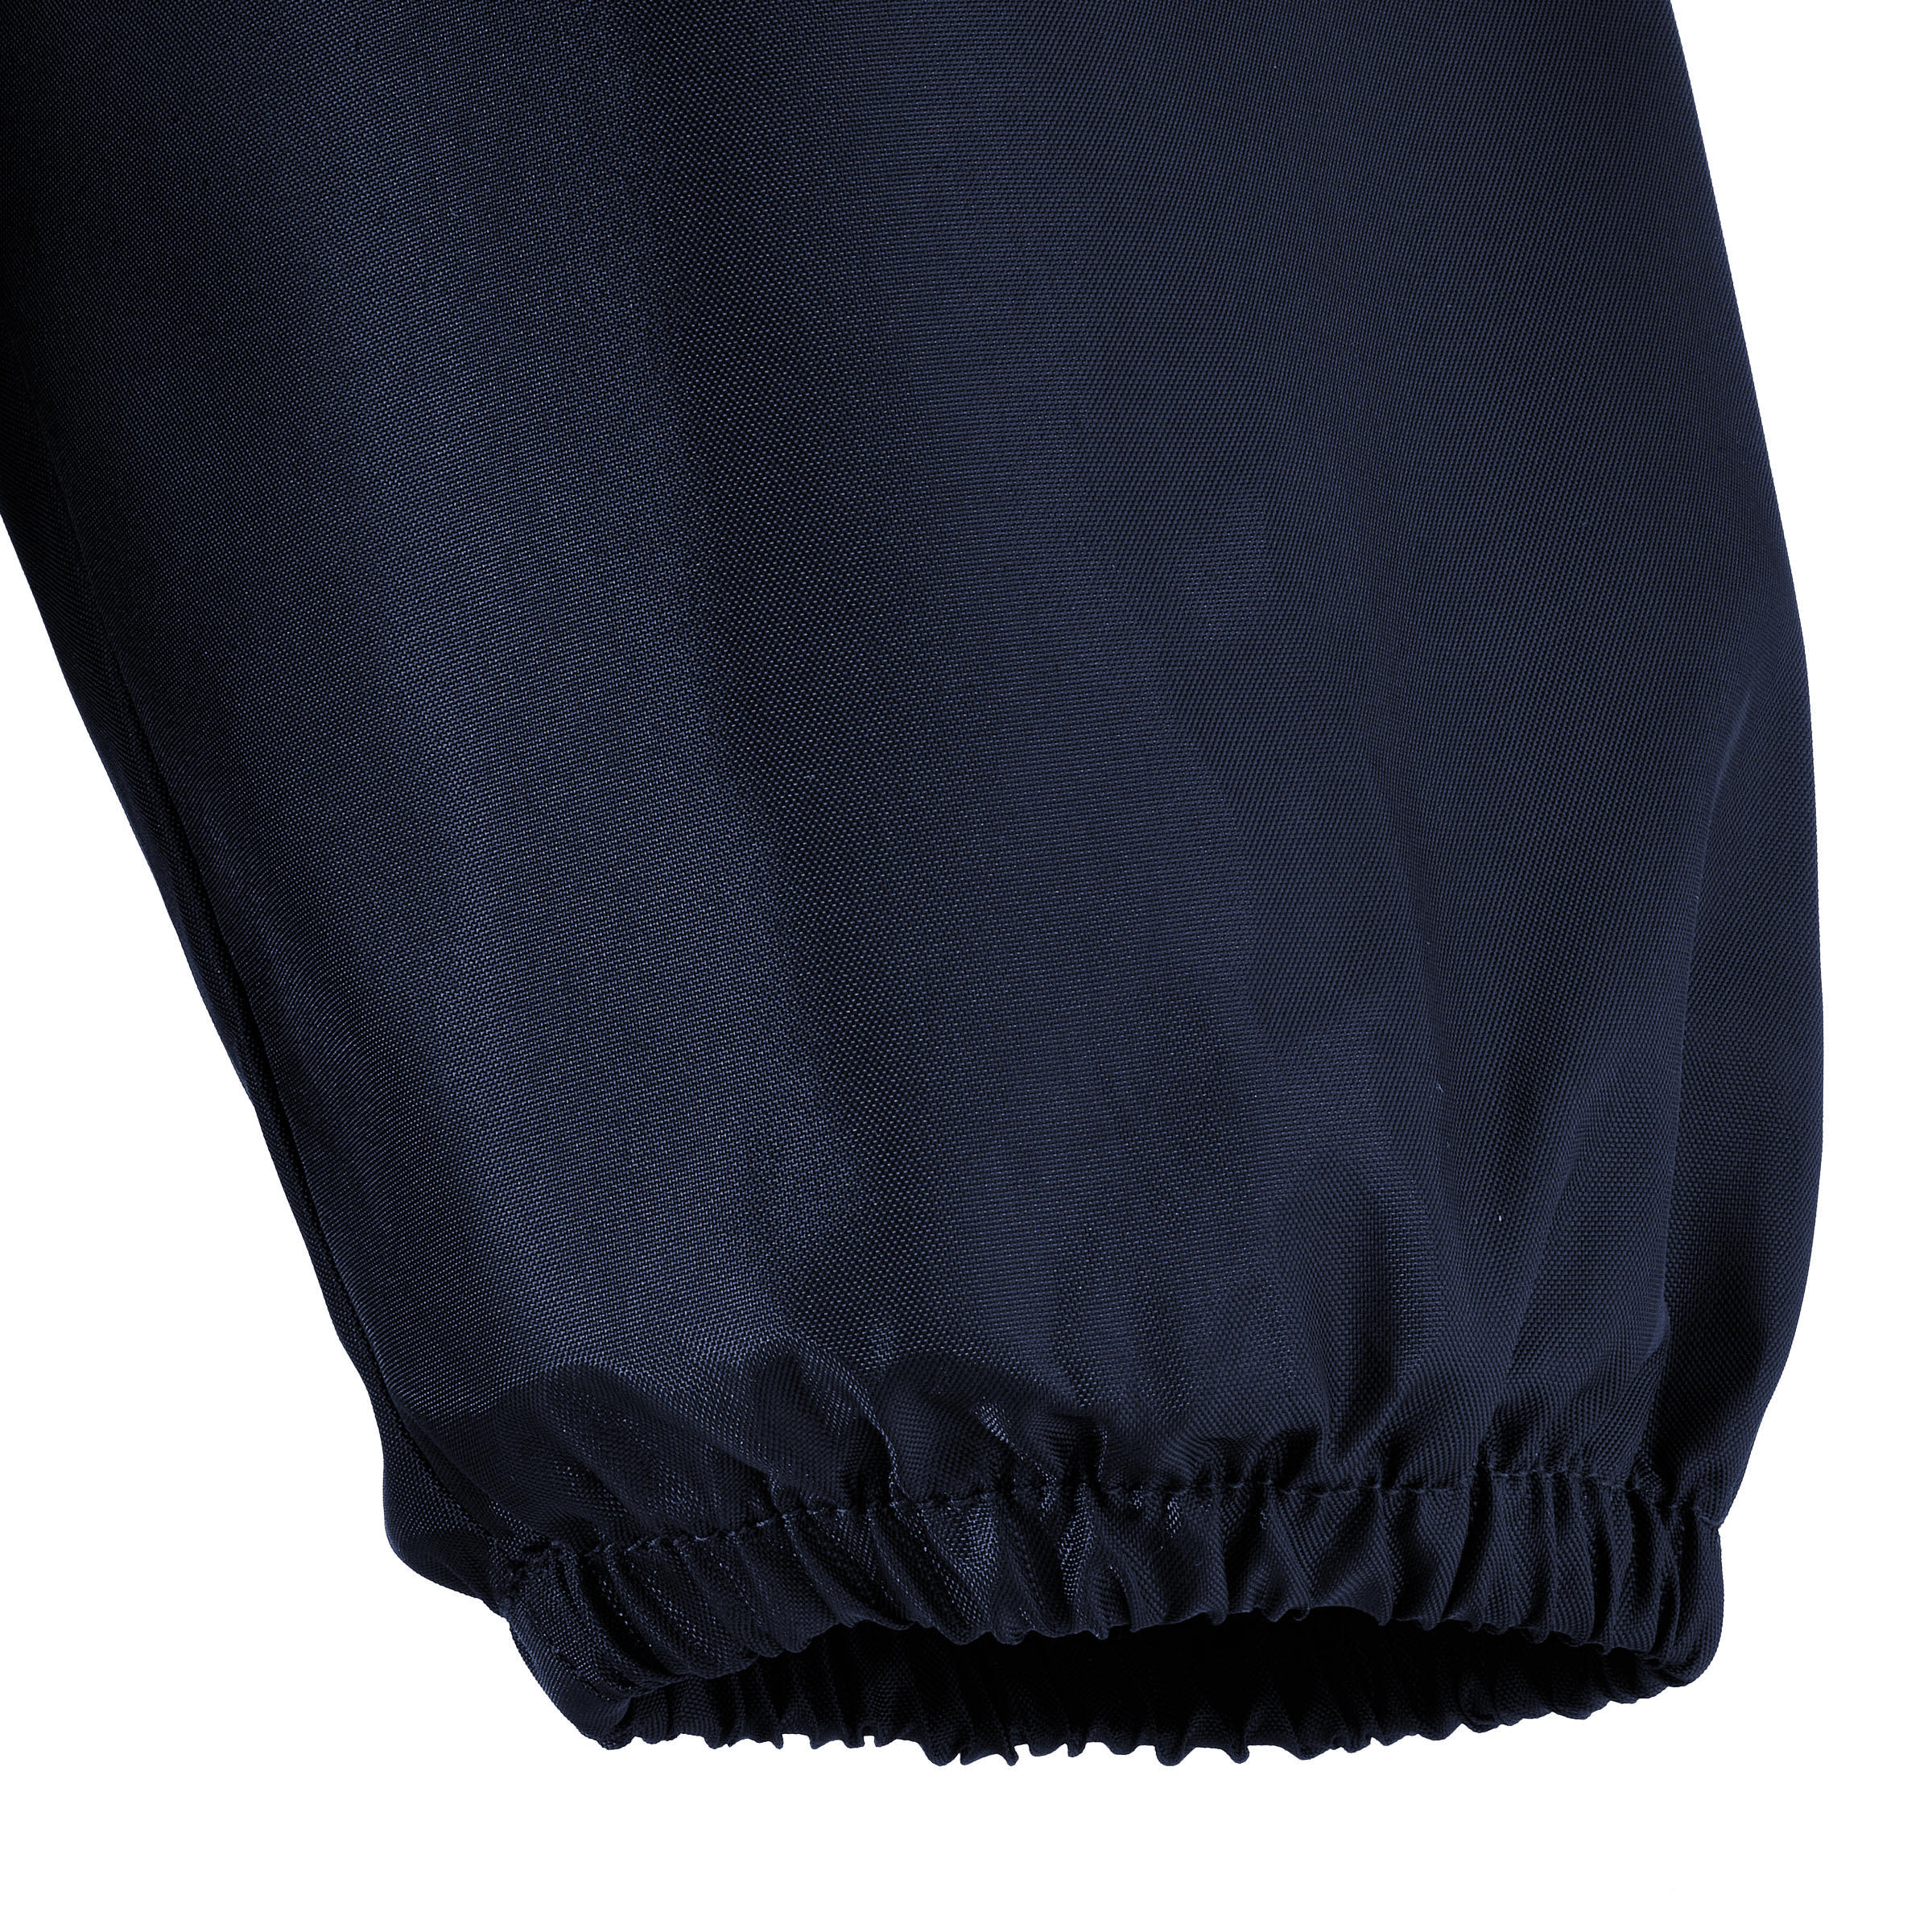 Raincoat Women's Waterproof Nature Hiking Jacket - Dark Navy Blue